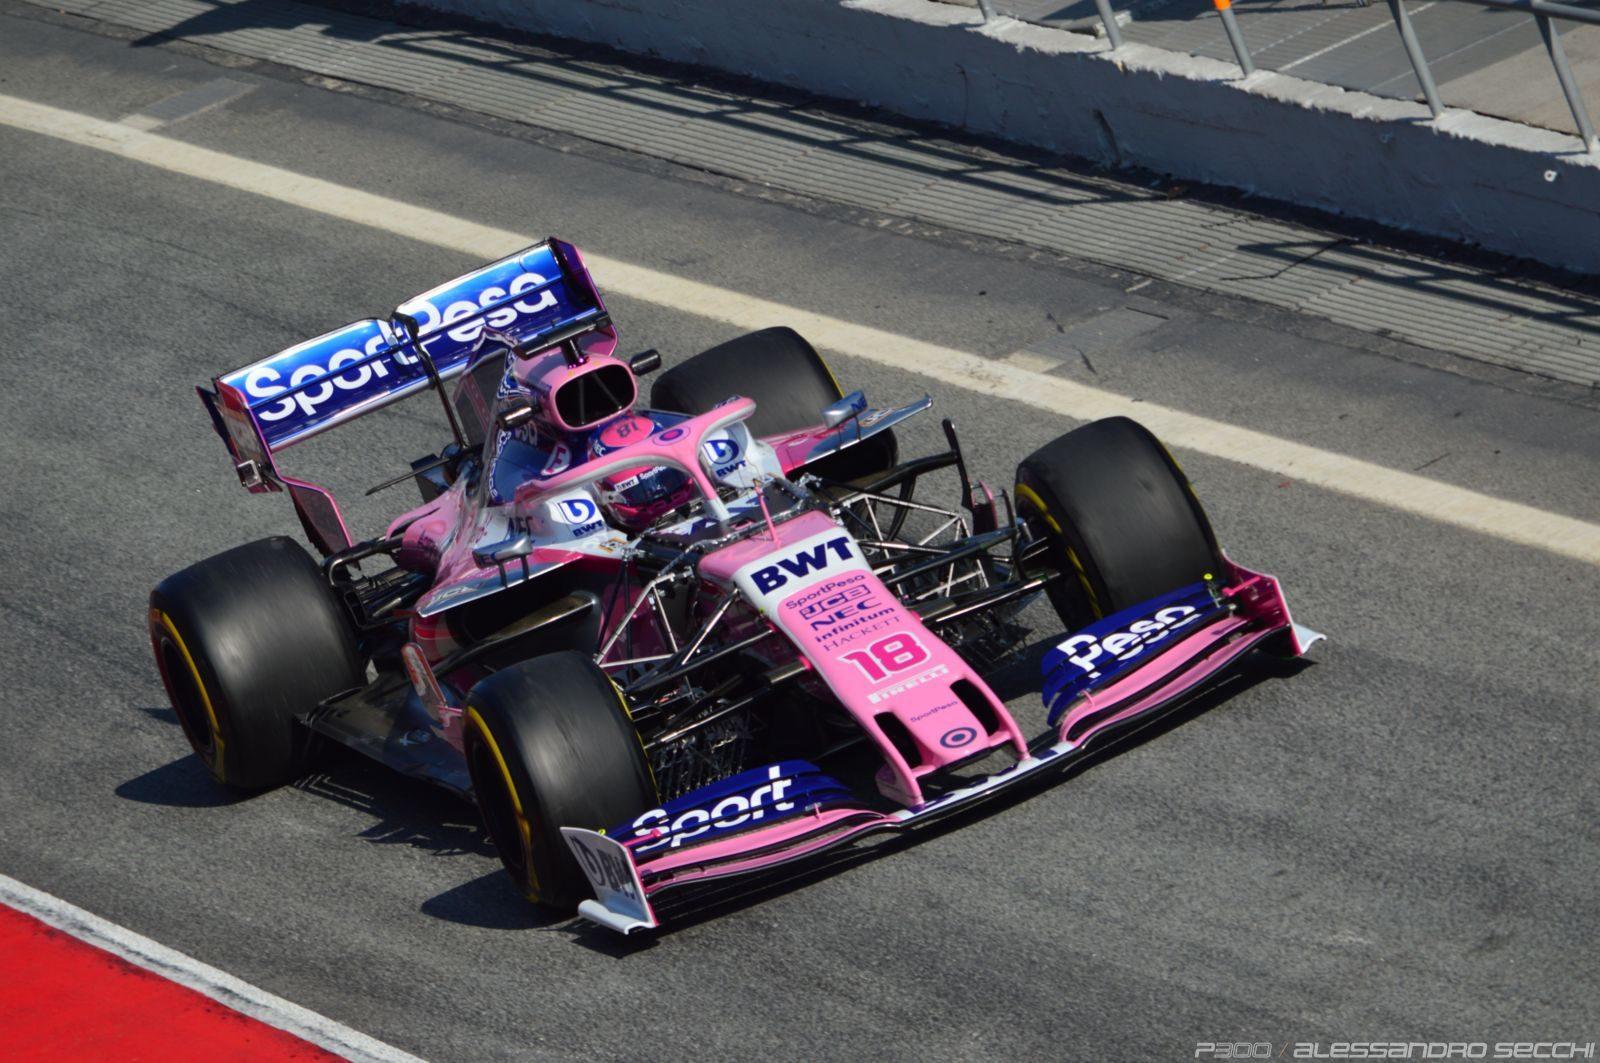 F1_test_barcellona_2019_d4b_DSC_0080